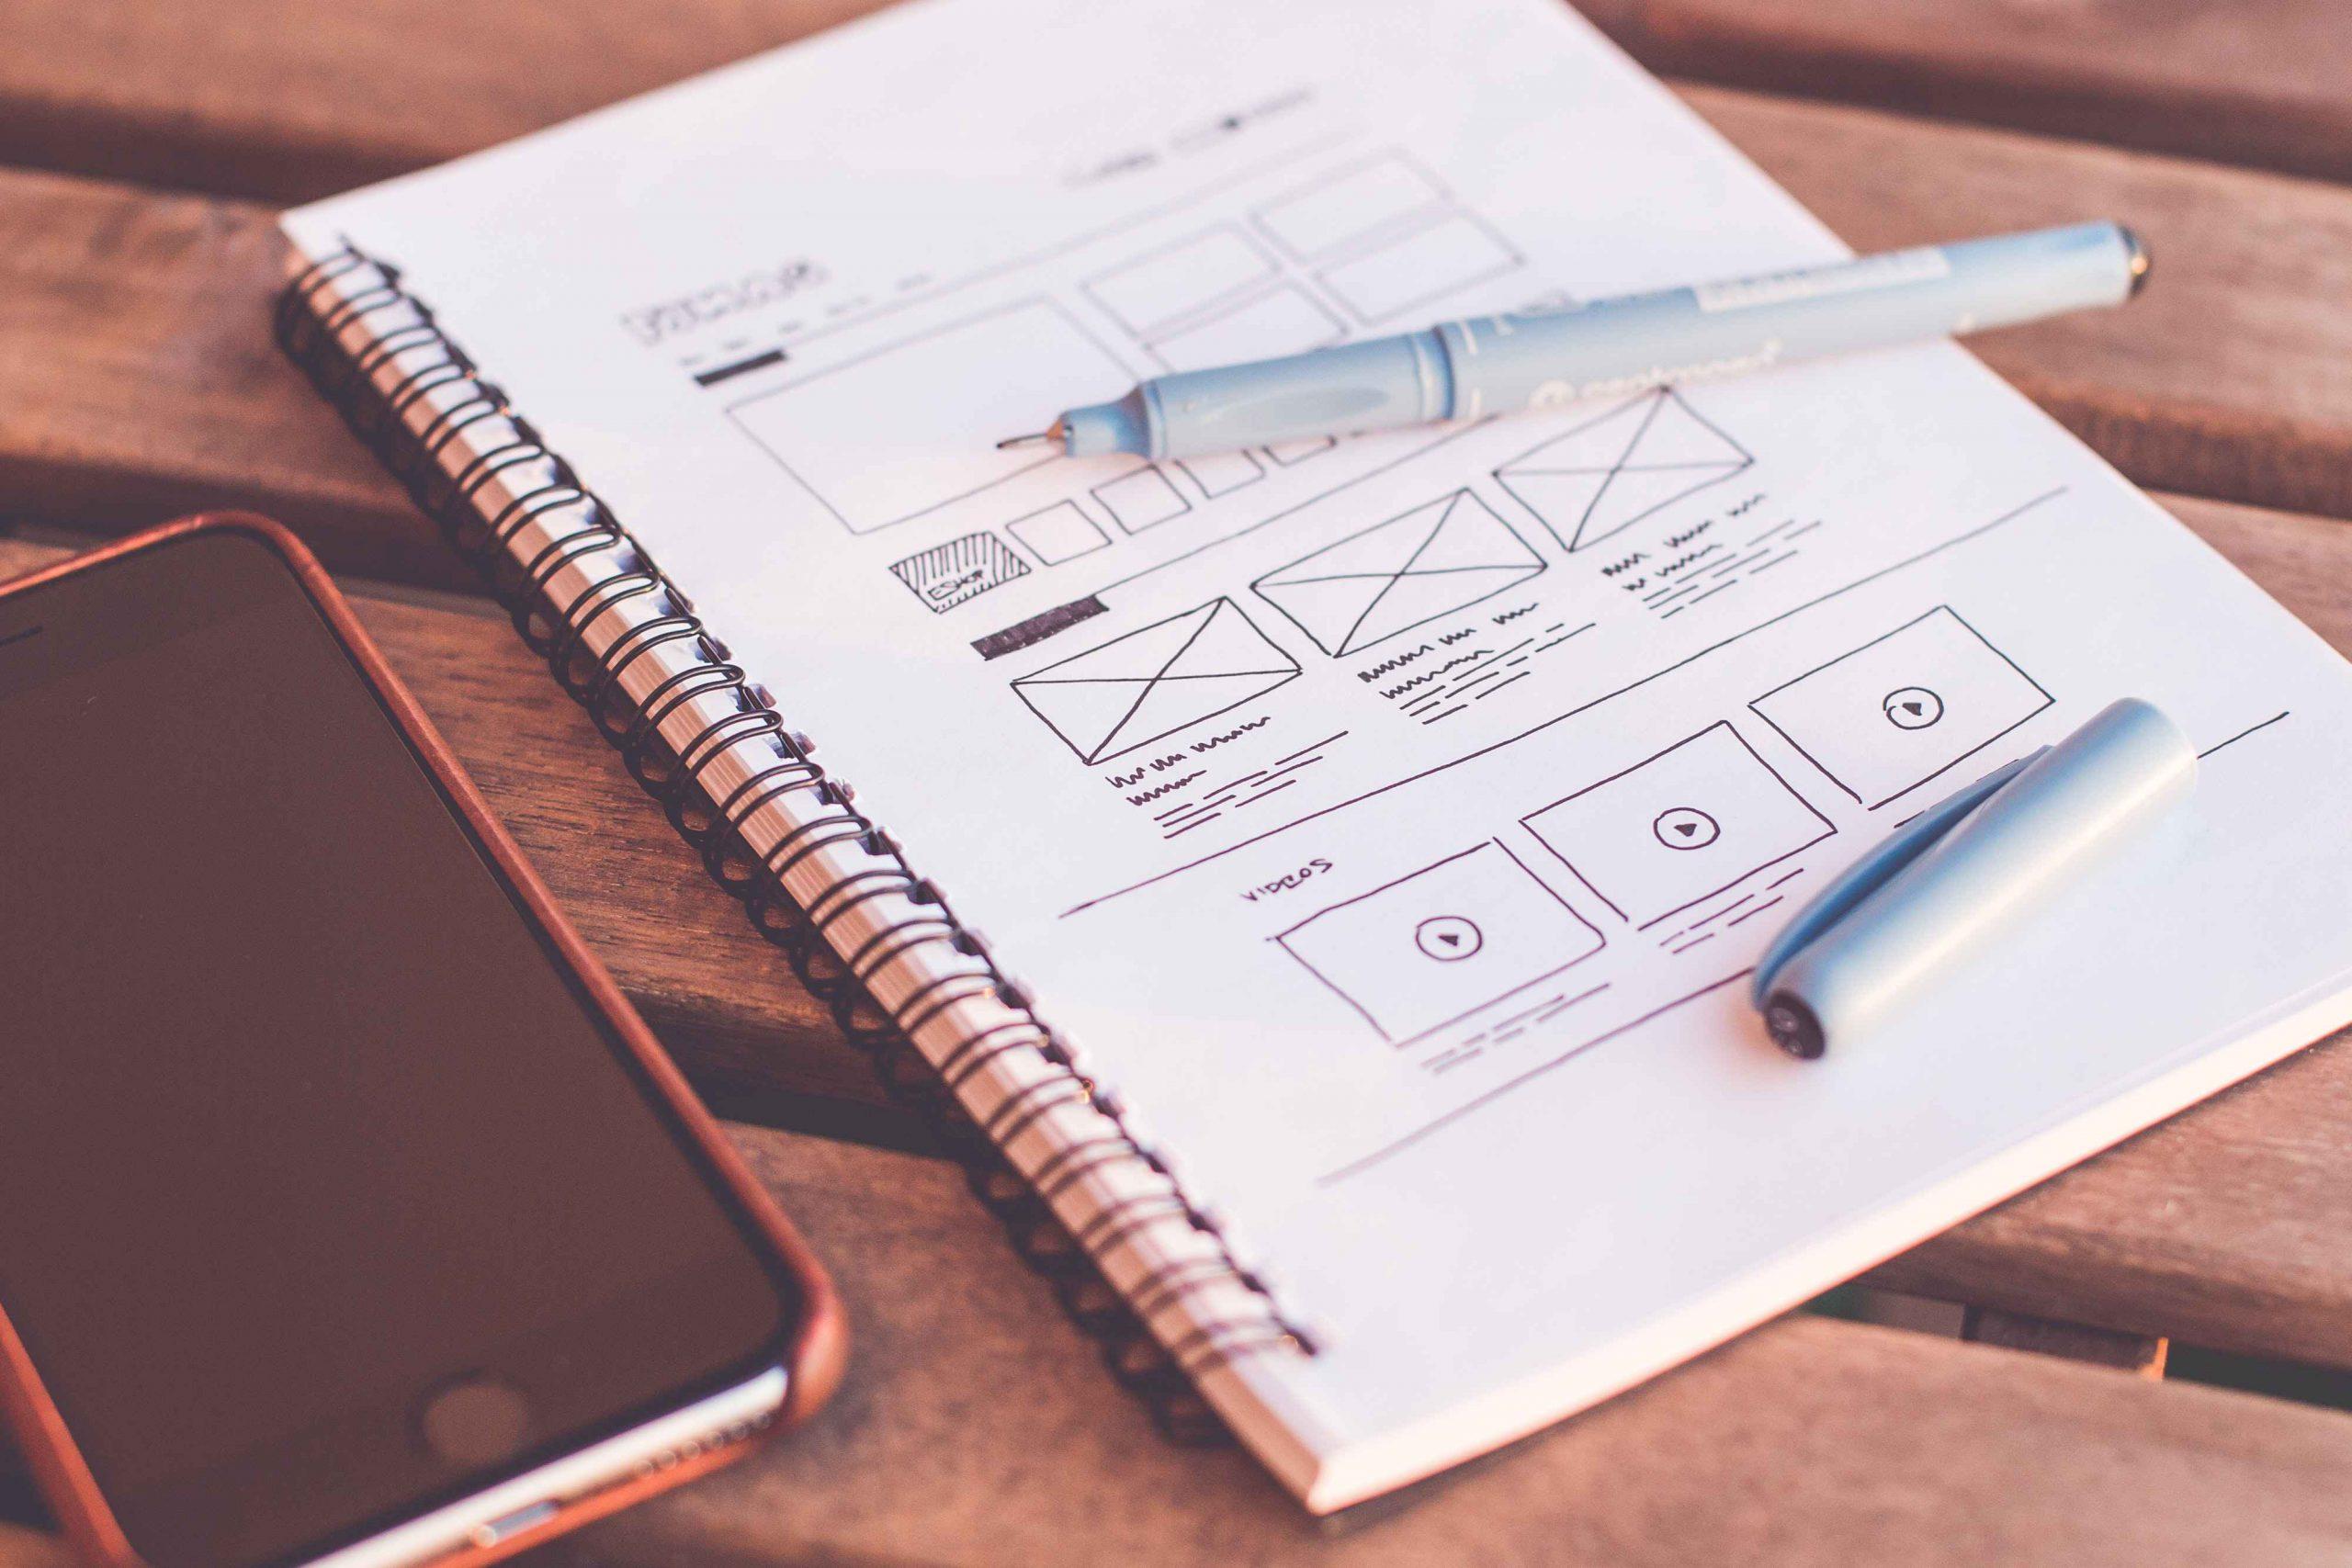 Web design flow